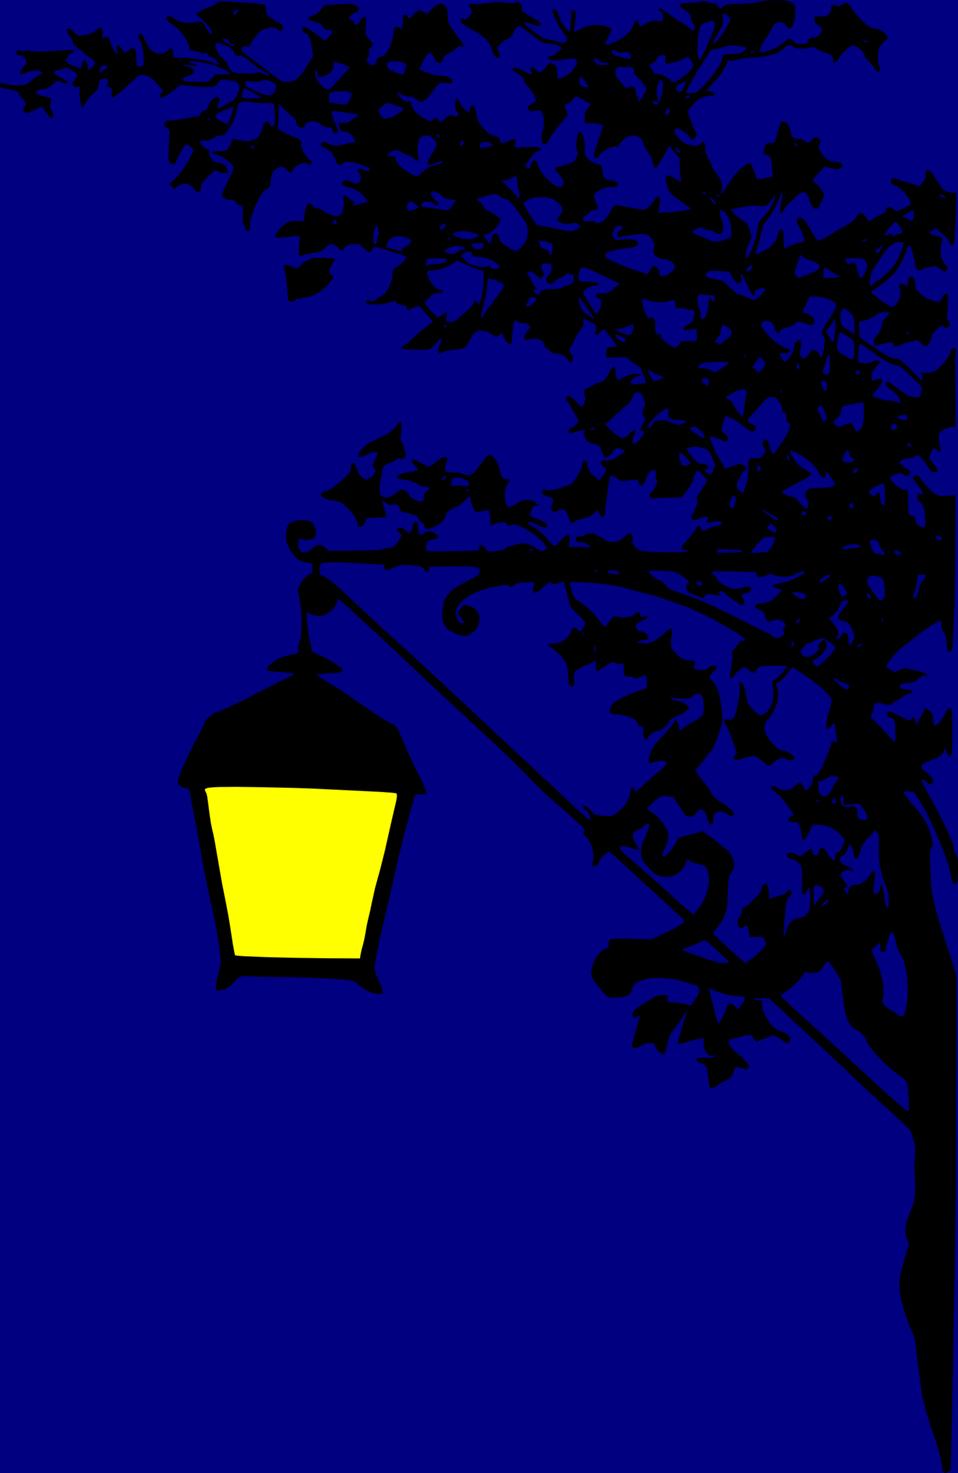 Vintage street lamp silhouette